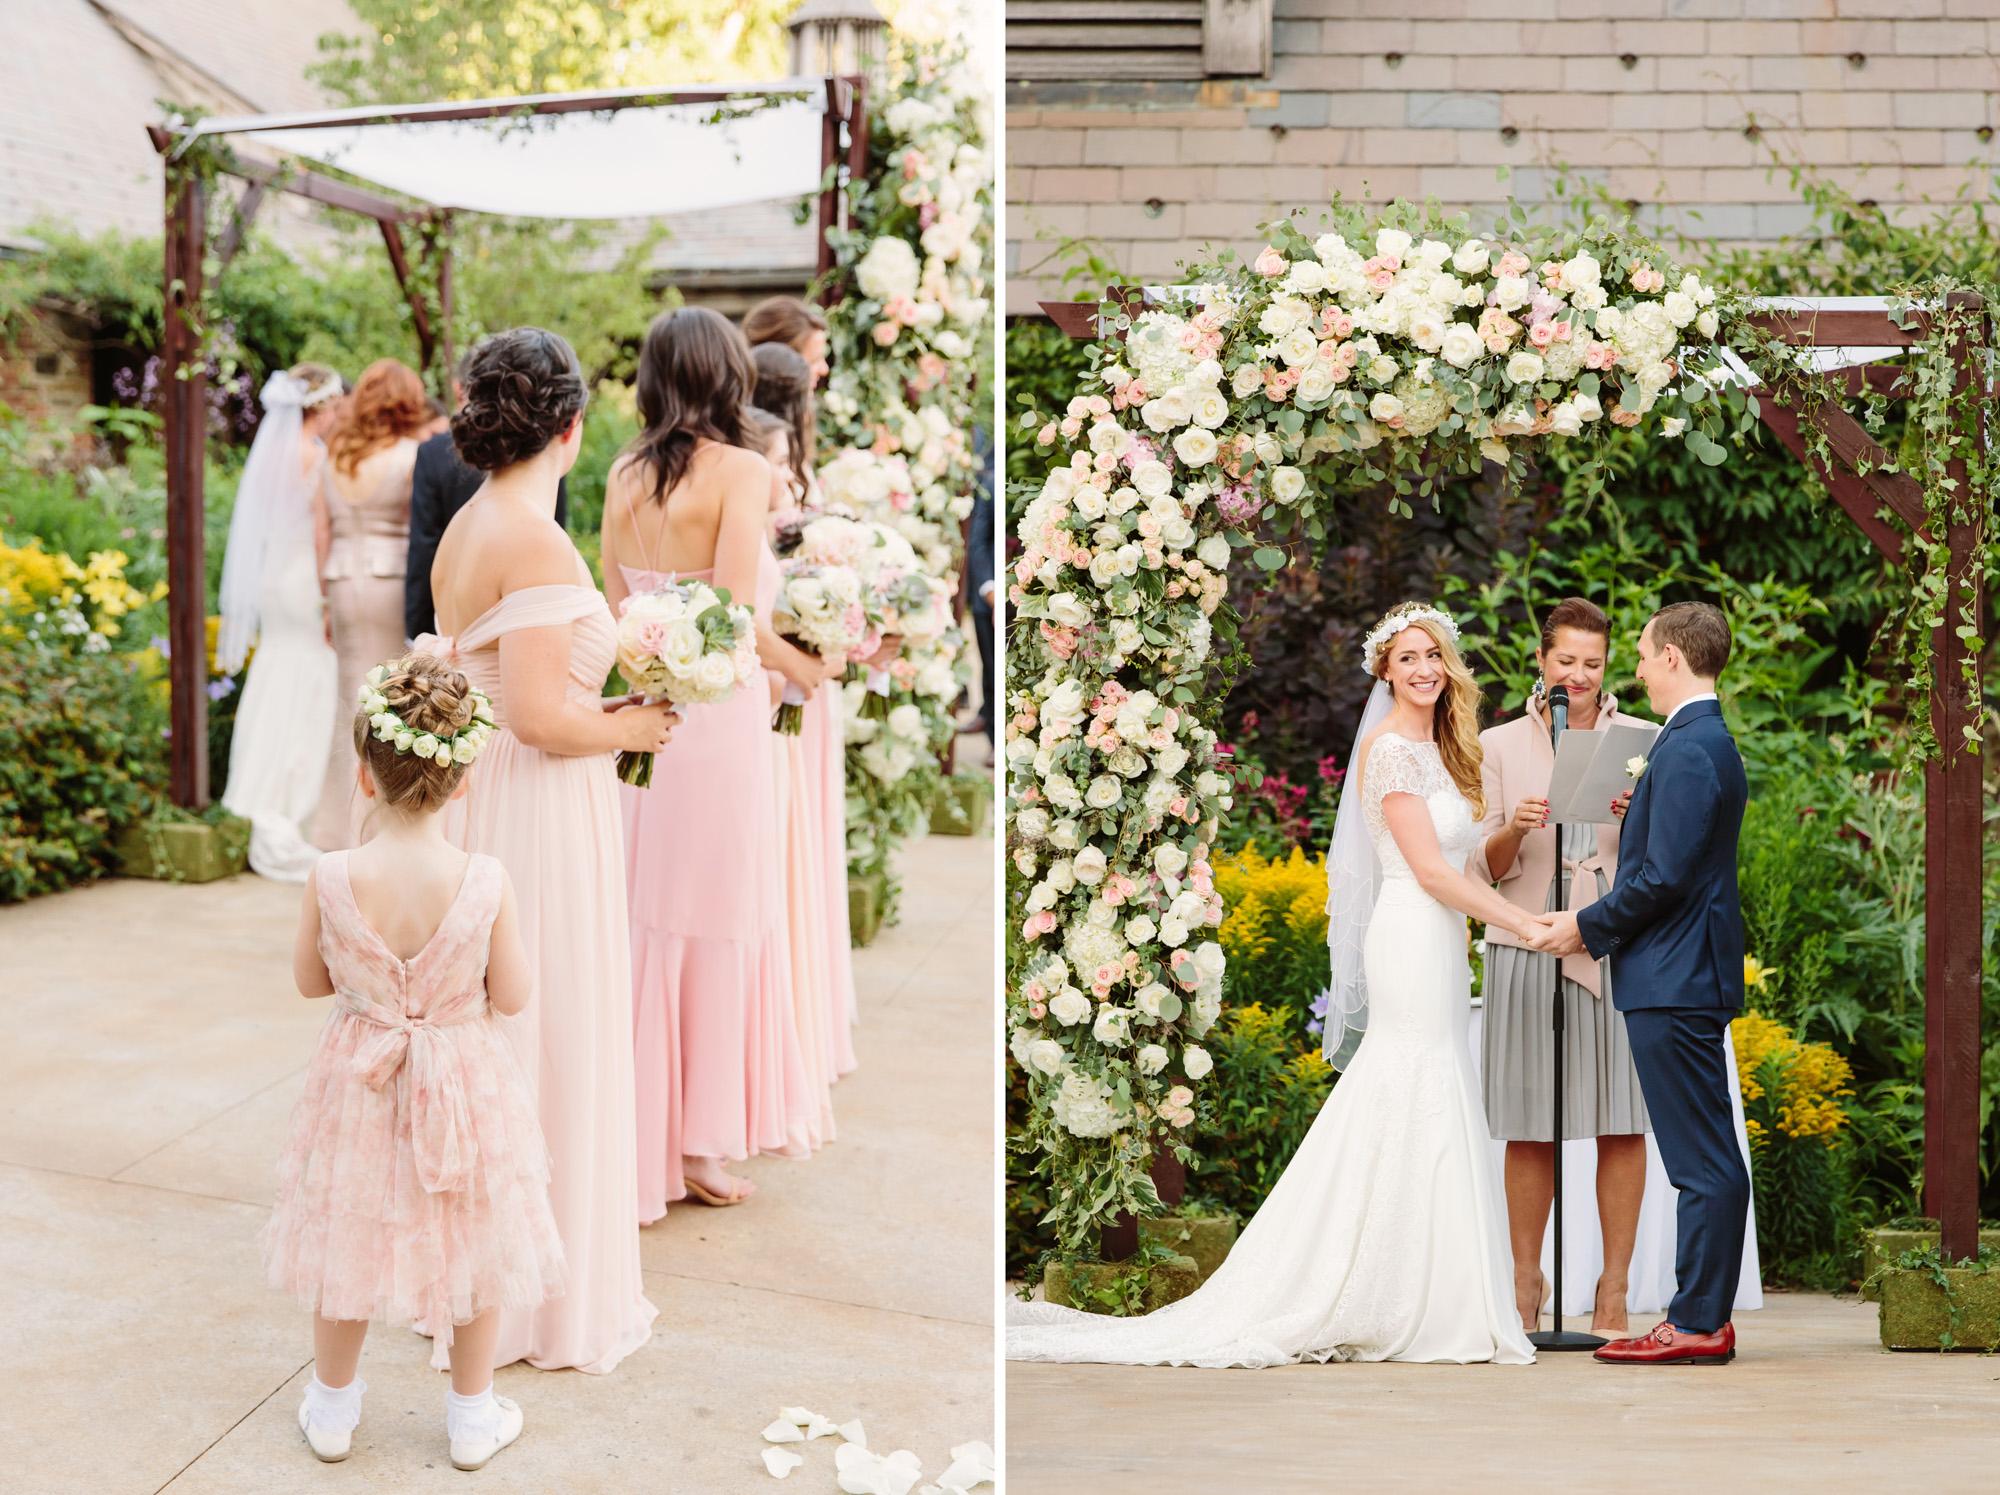 45_Jessica_Ted_Blue_Hill_Stone_Barns_Wedding_Pocantico_NY_Tanya_Salazar_Photography.jpg